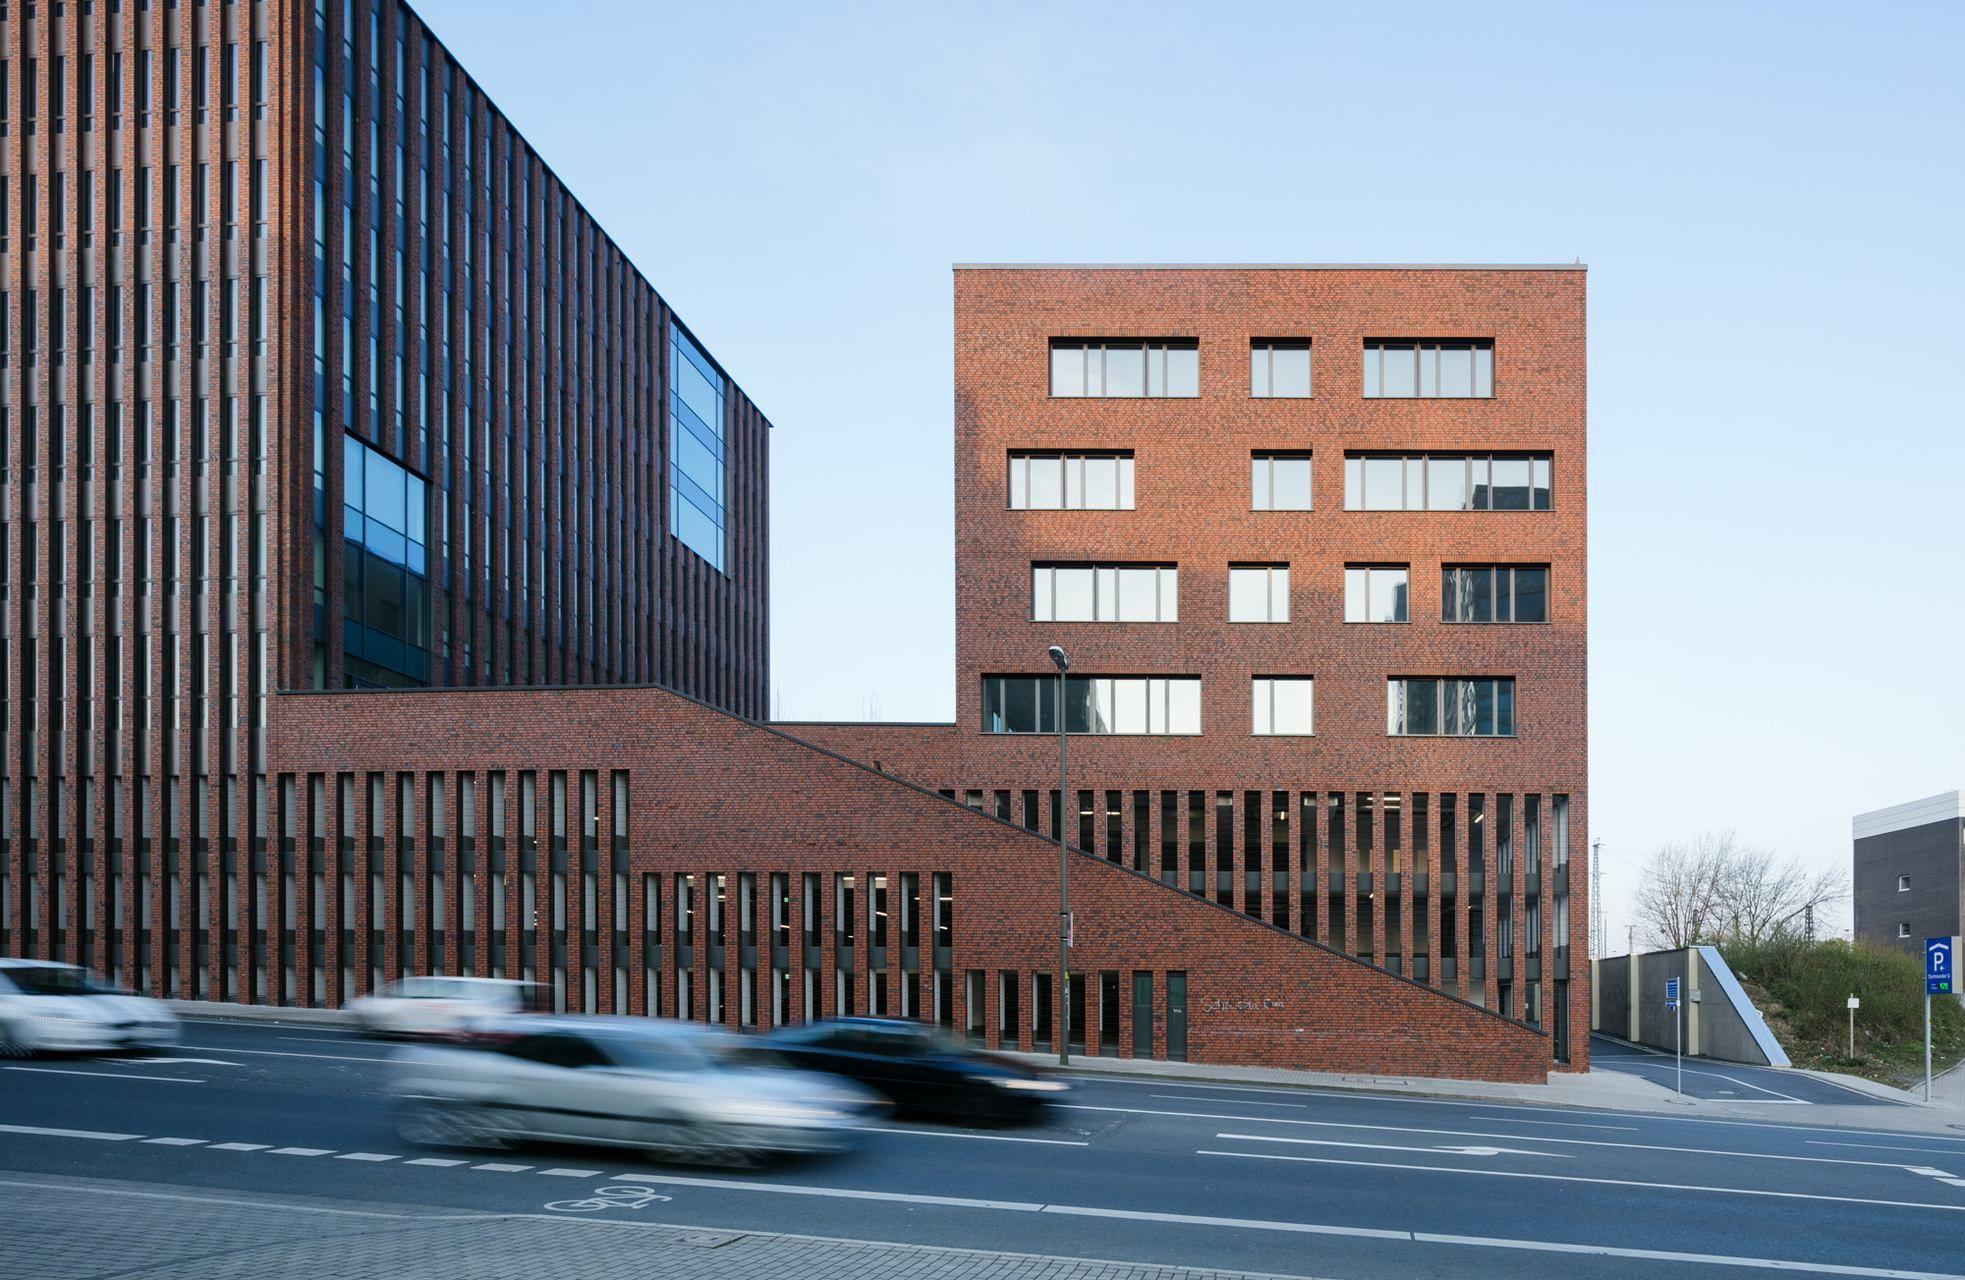 Architekt Dortmund hg esch photography u viertel dortmund gerber architekten dortmund